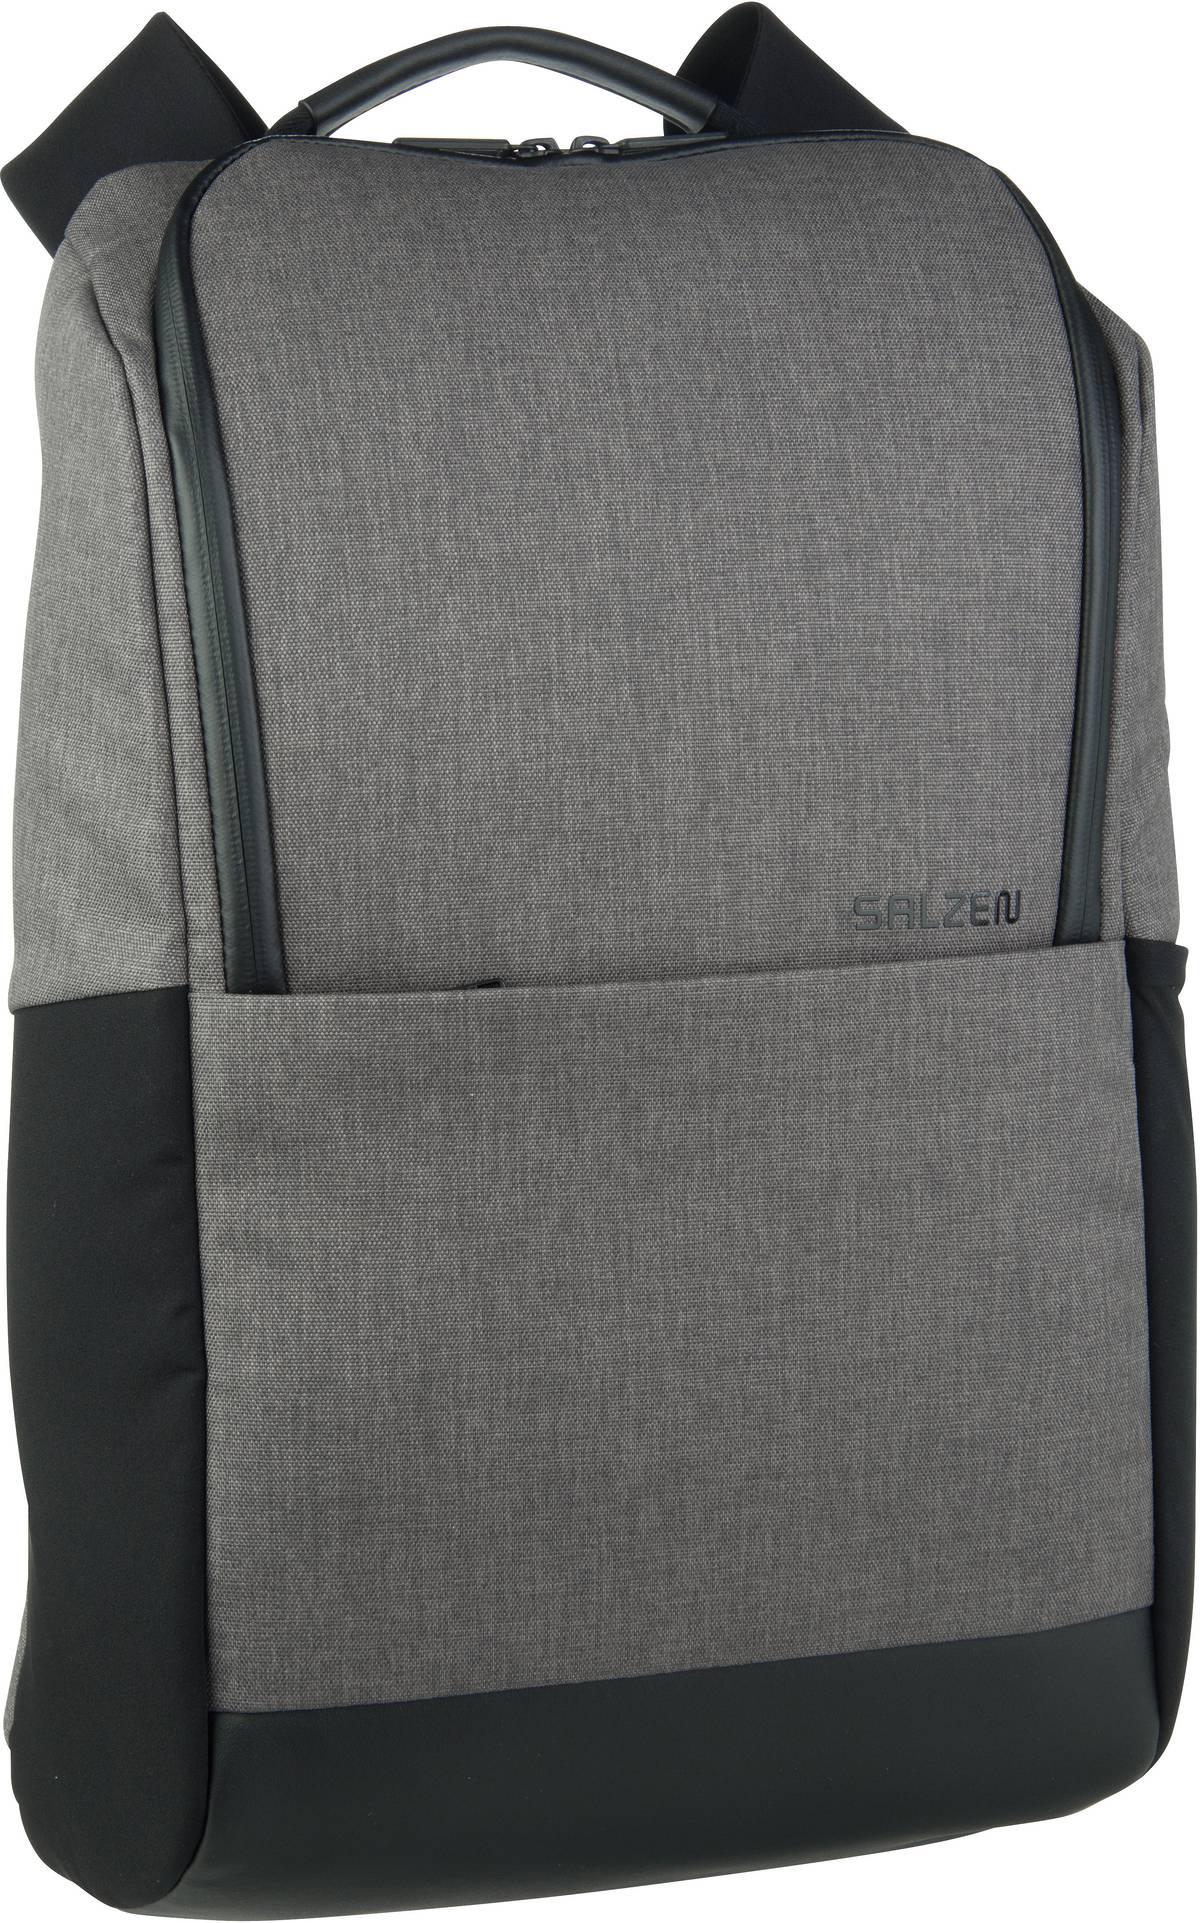 Rucksack / Daypack Daypack Fabric Storm Grey (15 Liter)